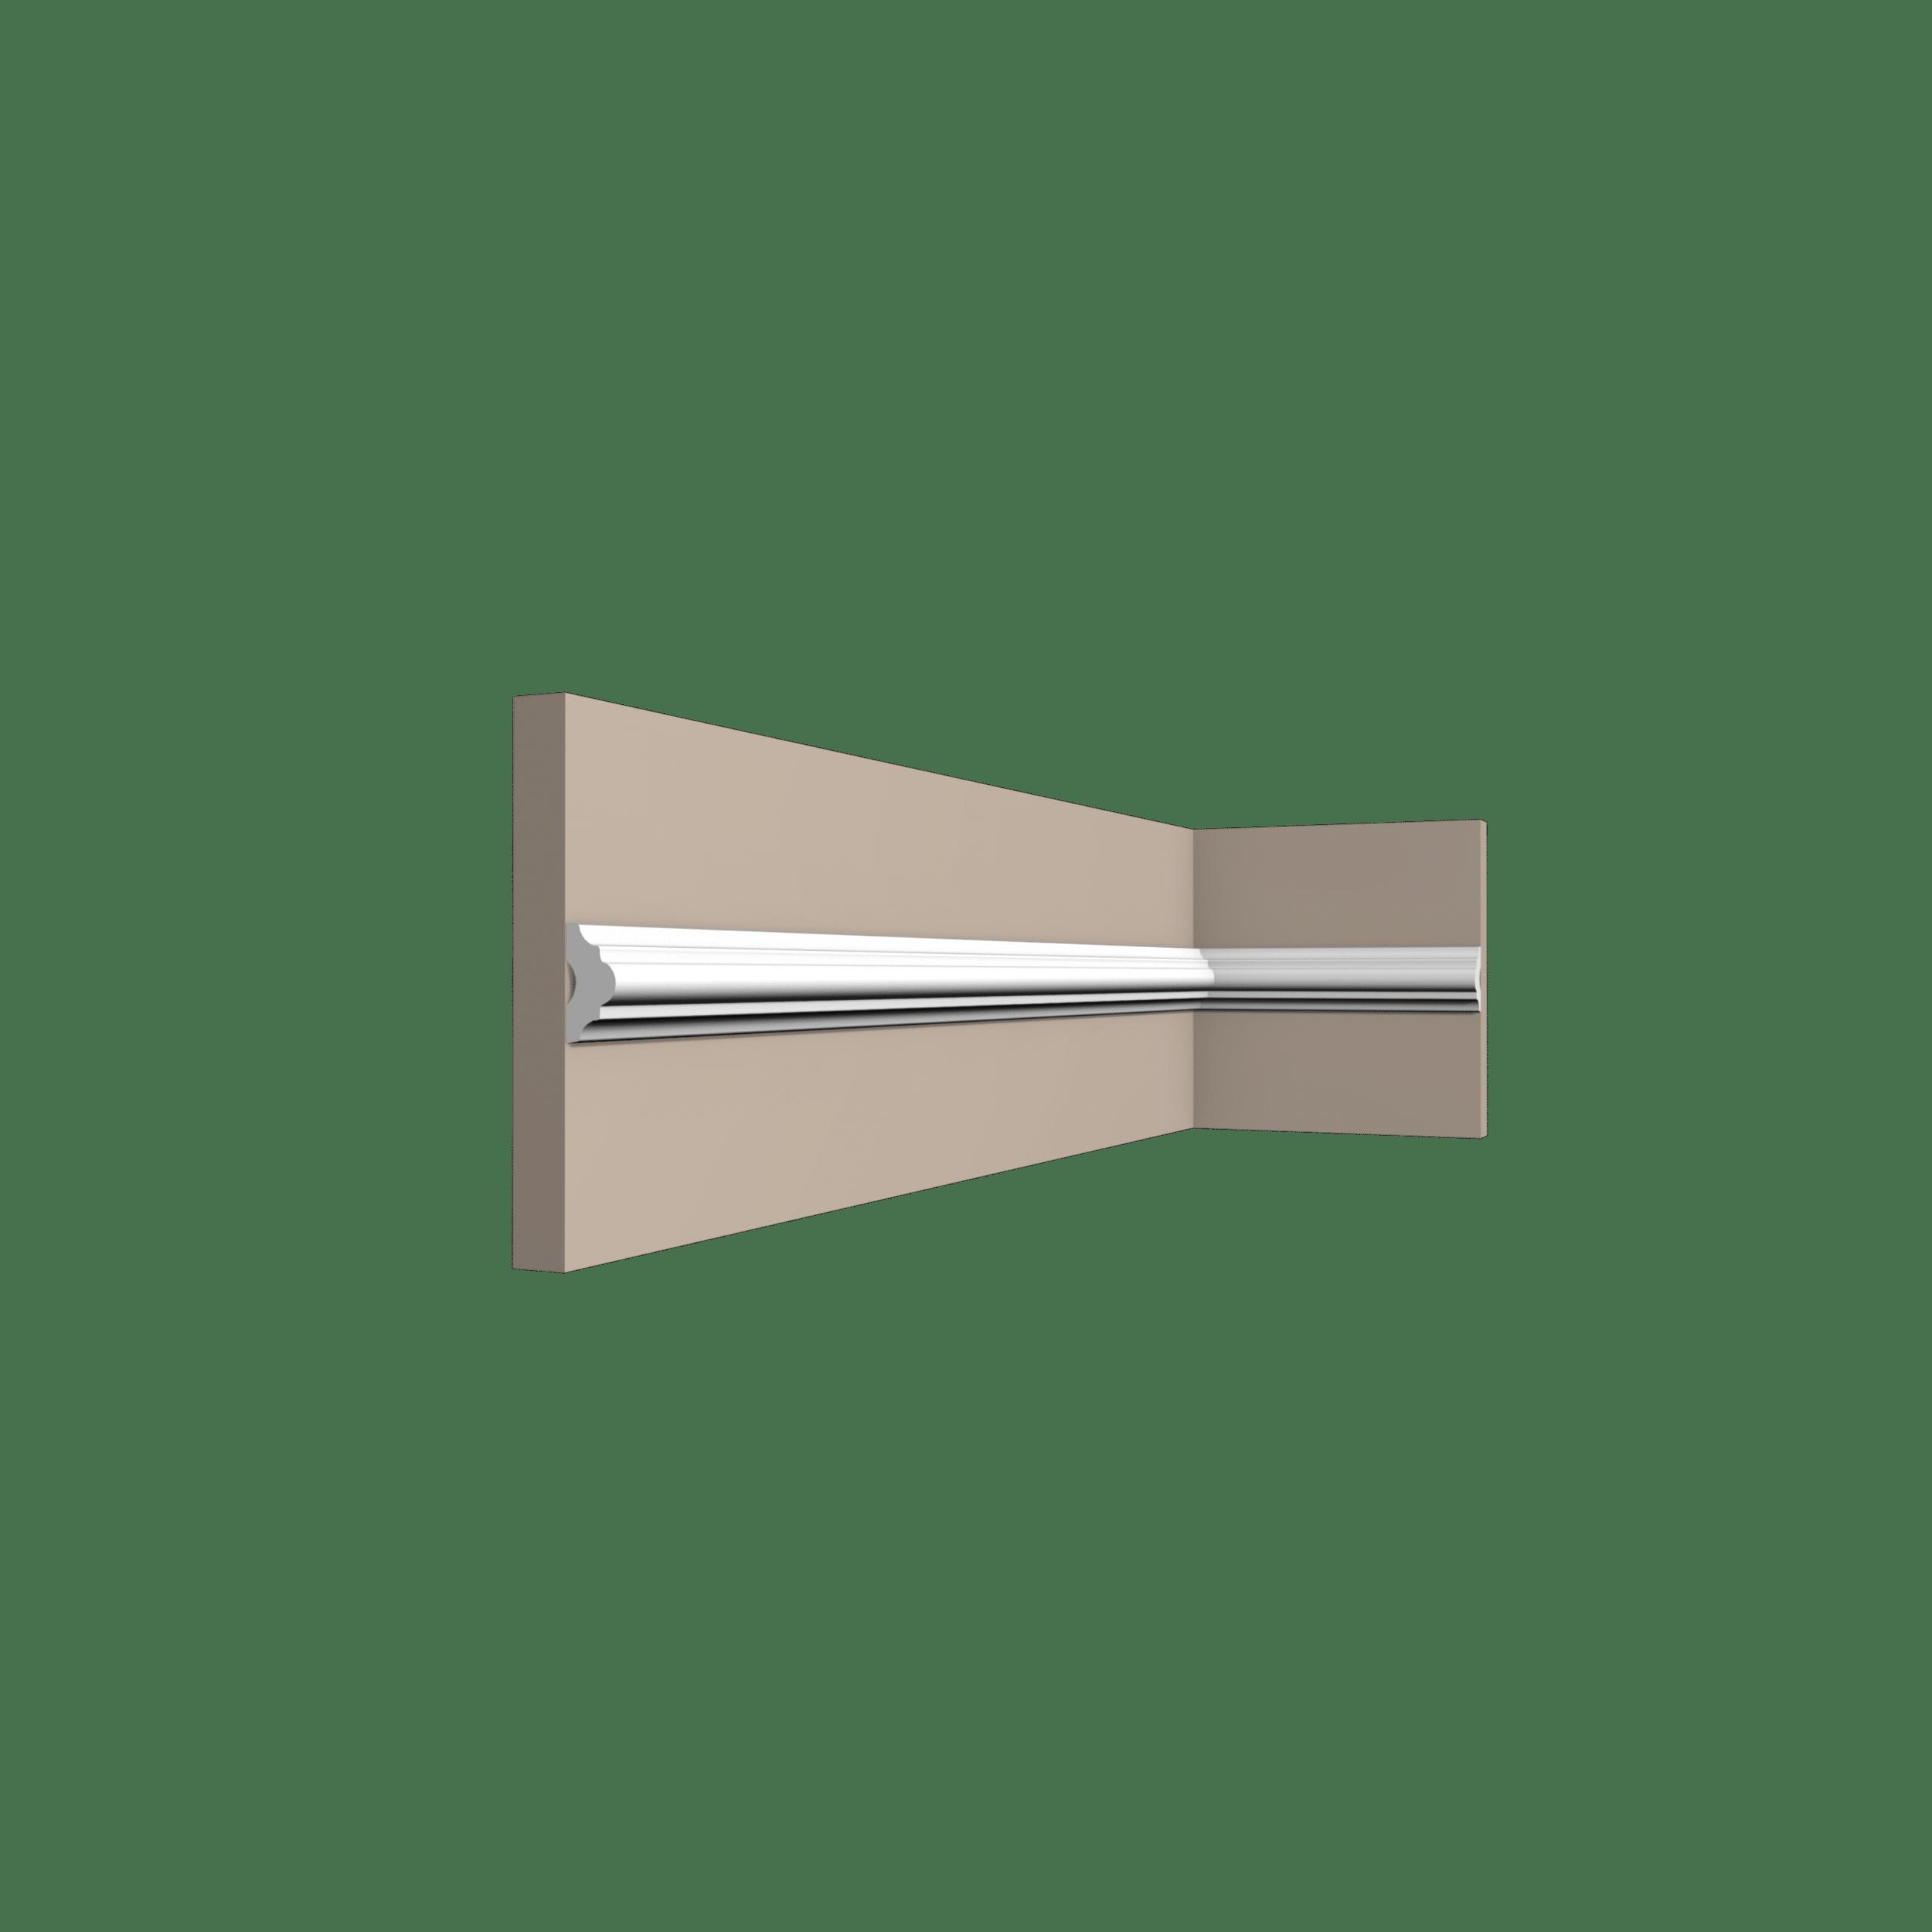 קרניז פוליאוריתן דגם DS - 2605